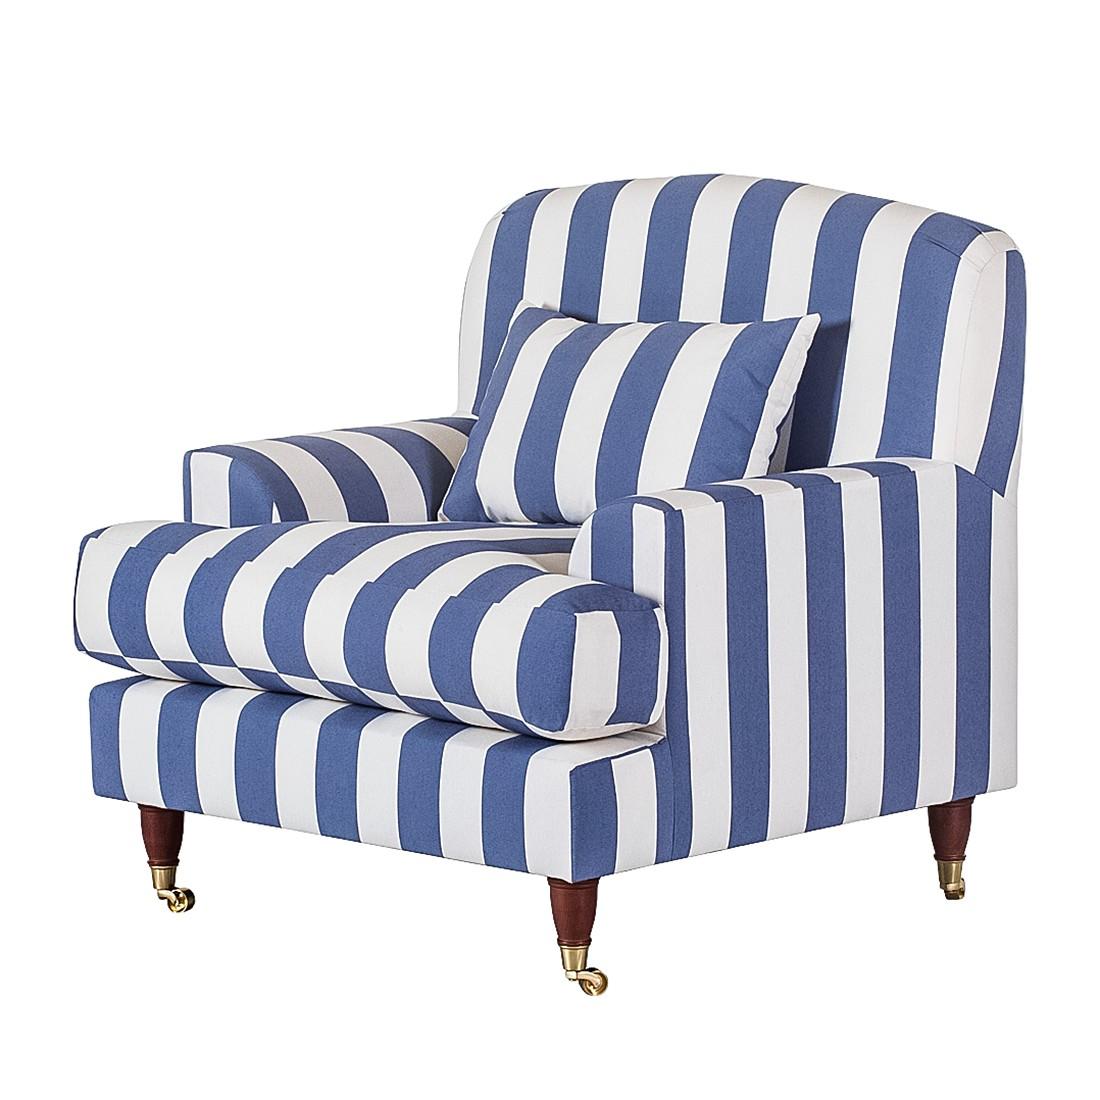 Sessel Bent – Webstoff Blau gestreift, Maison Belfort bestellen